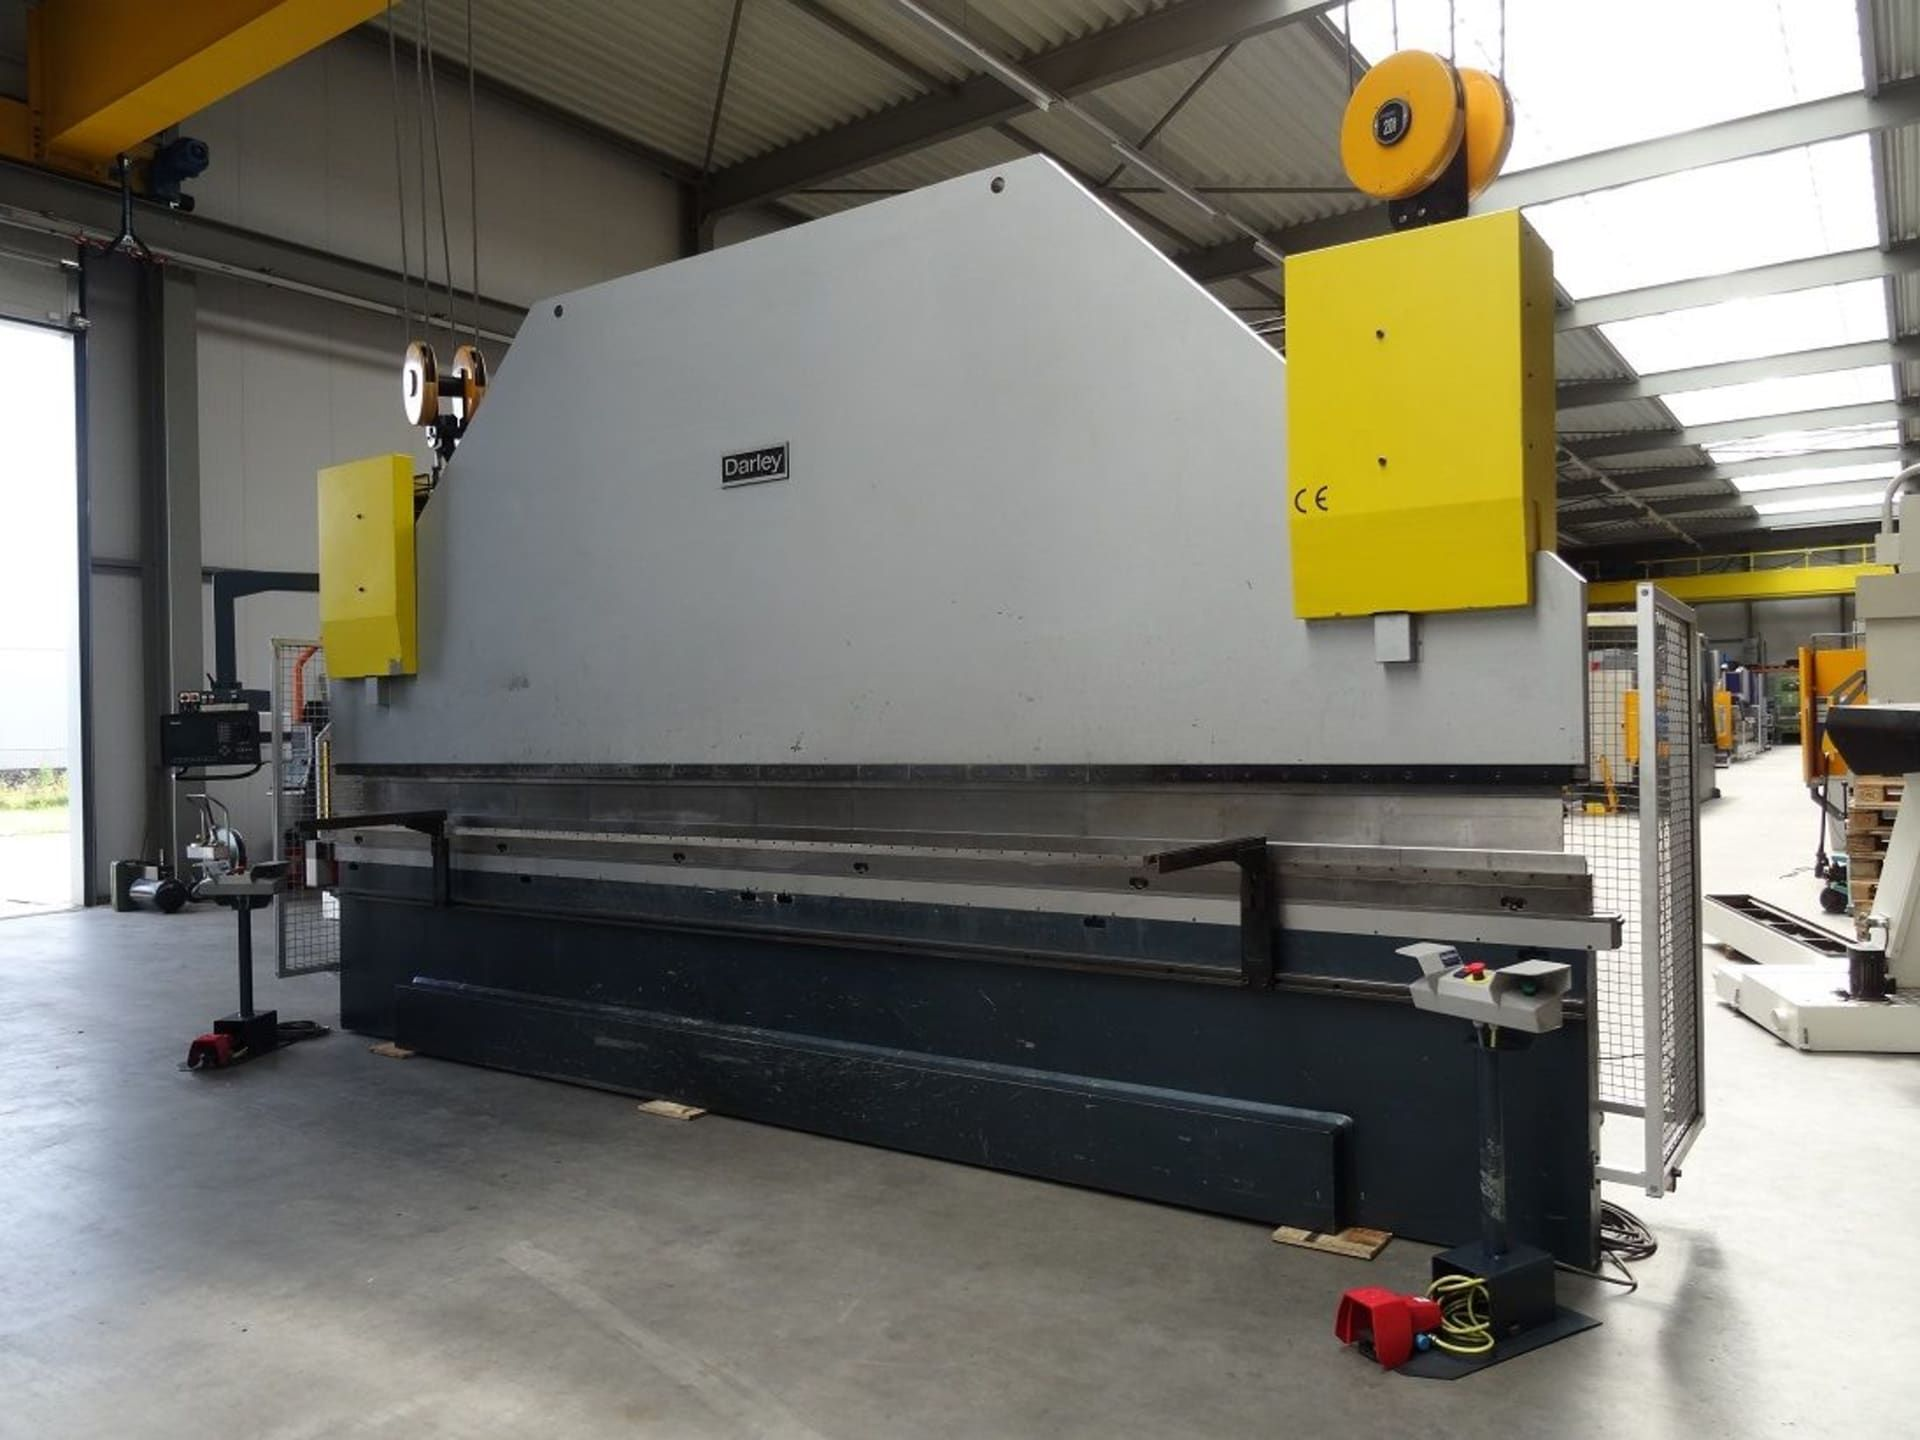 DARLEY EHP 200 62 / 51 CNC-Abkantpresse